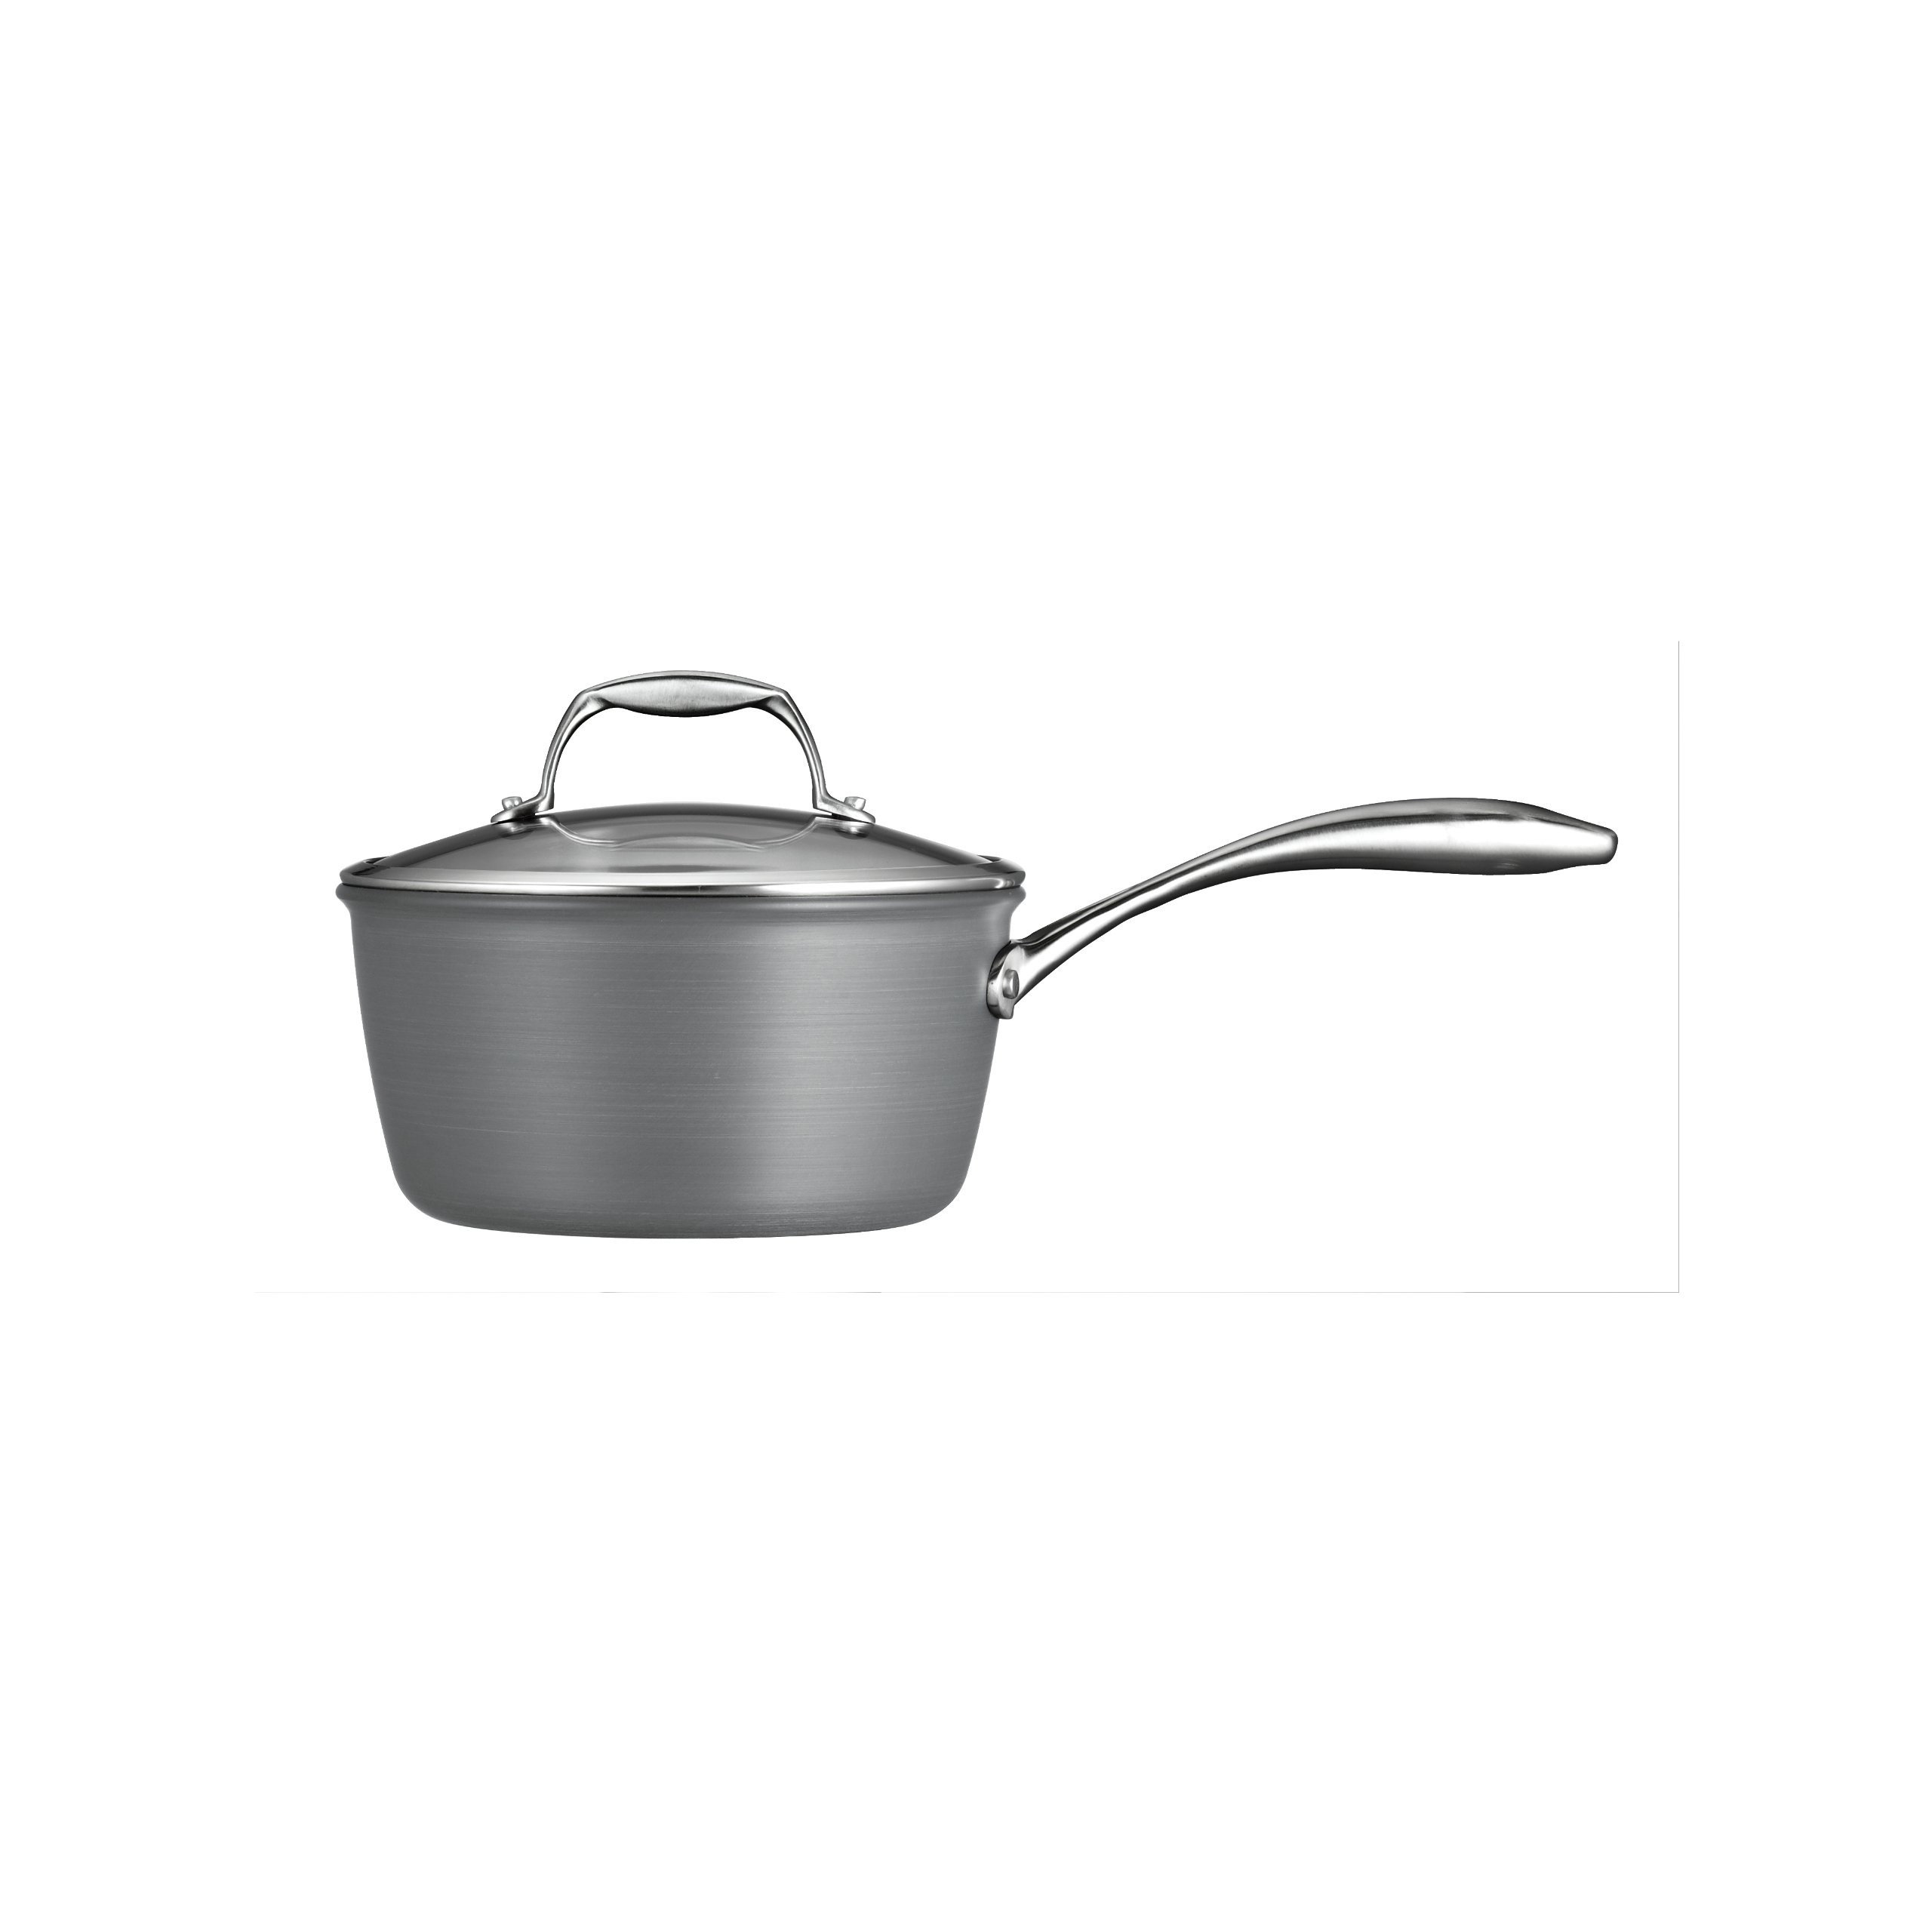 Tramontina  80123/012DS Gourmet Heavy-Gauge Aluminum Nonstick Covered Sauce Pan, 3-Quart, Hard Anodized